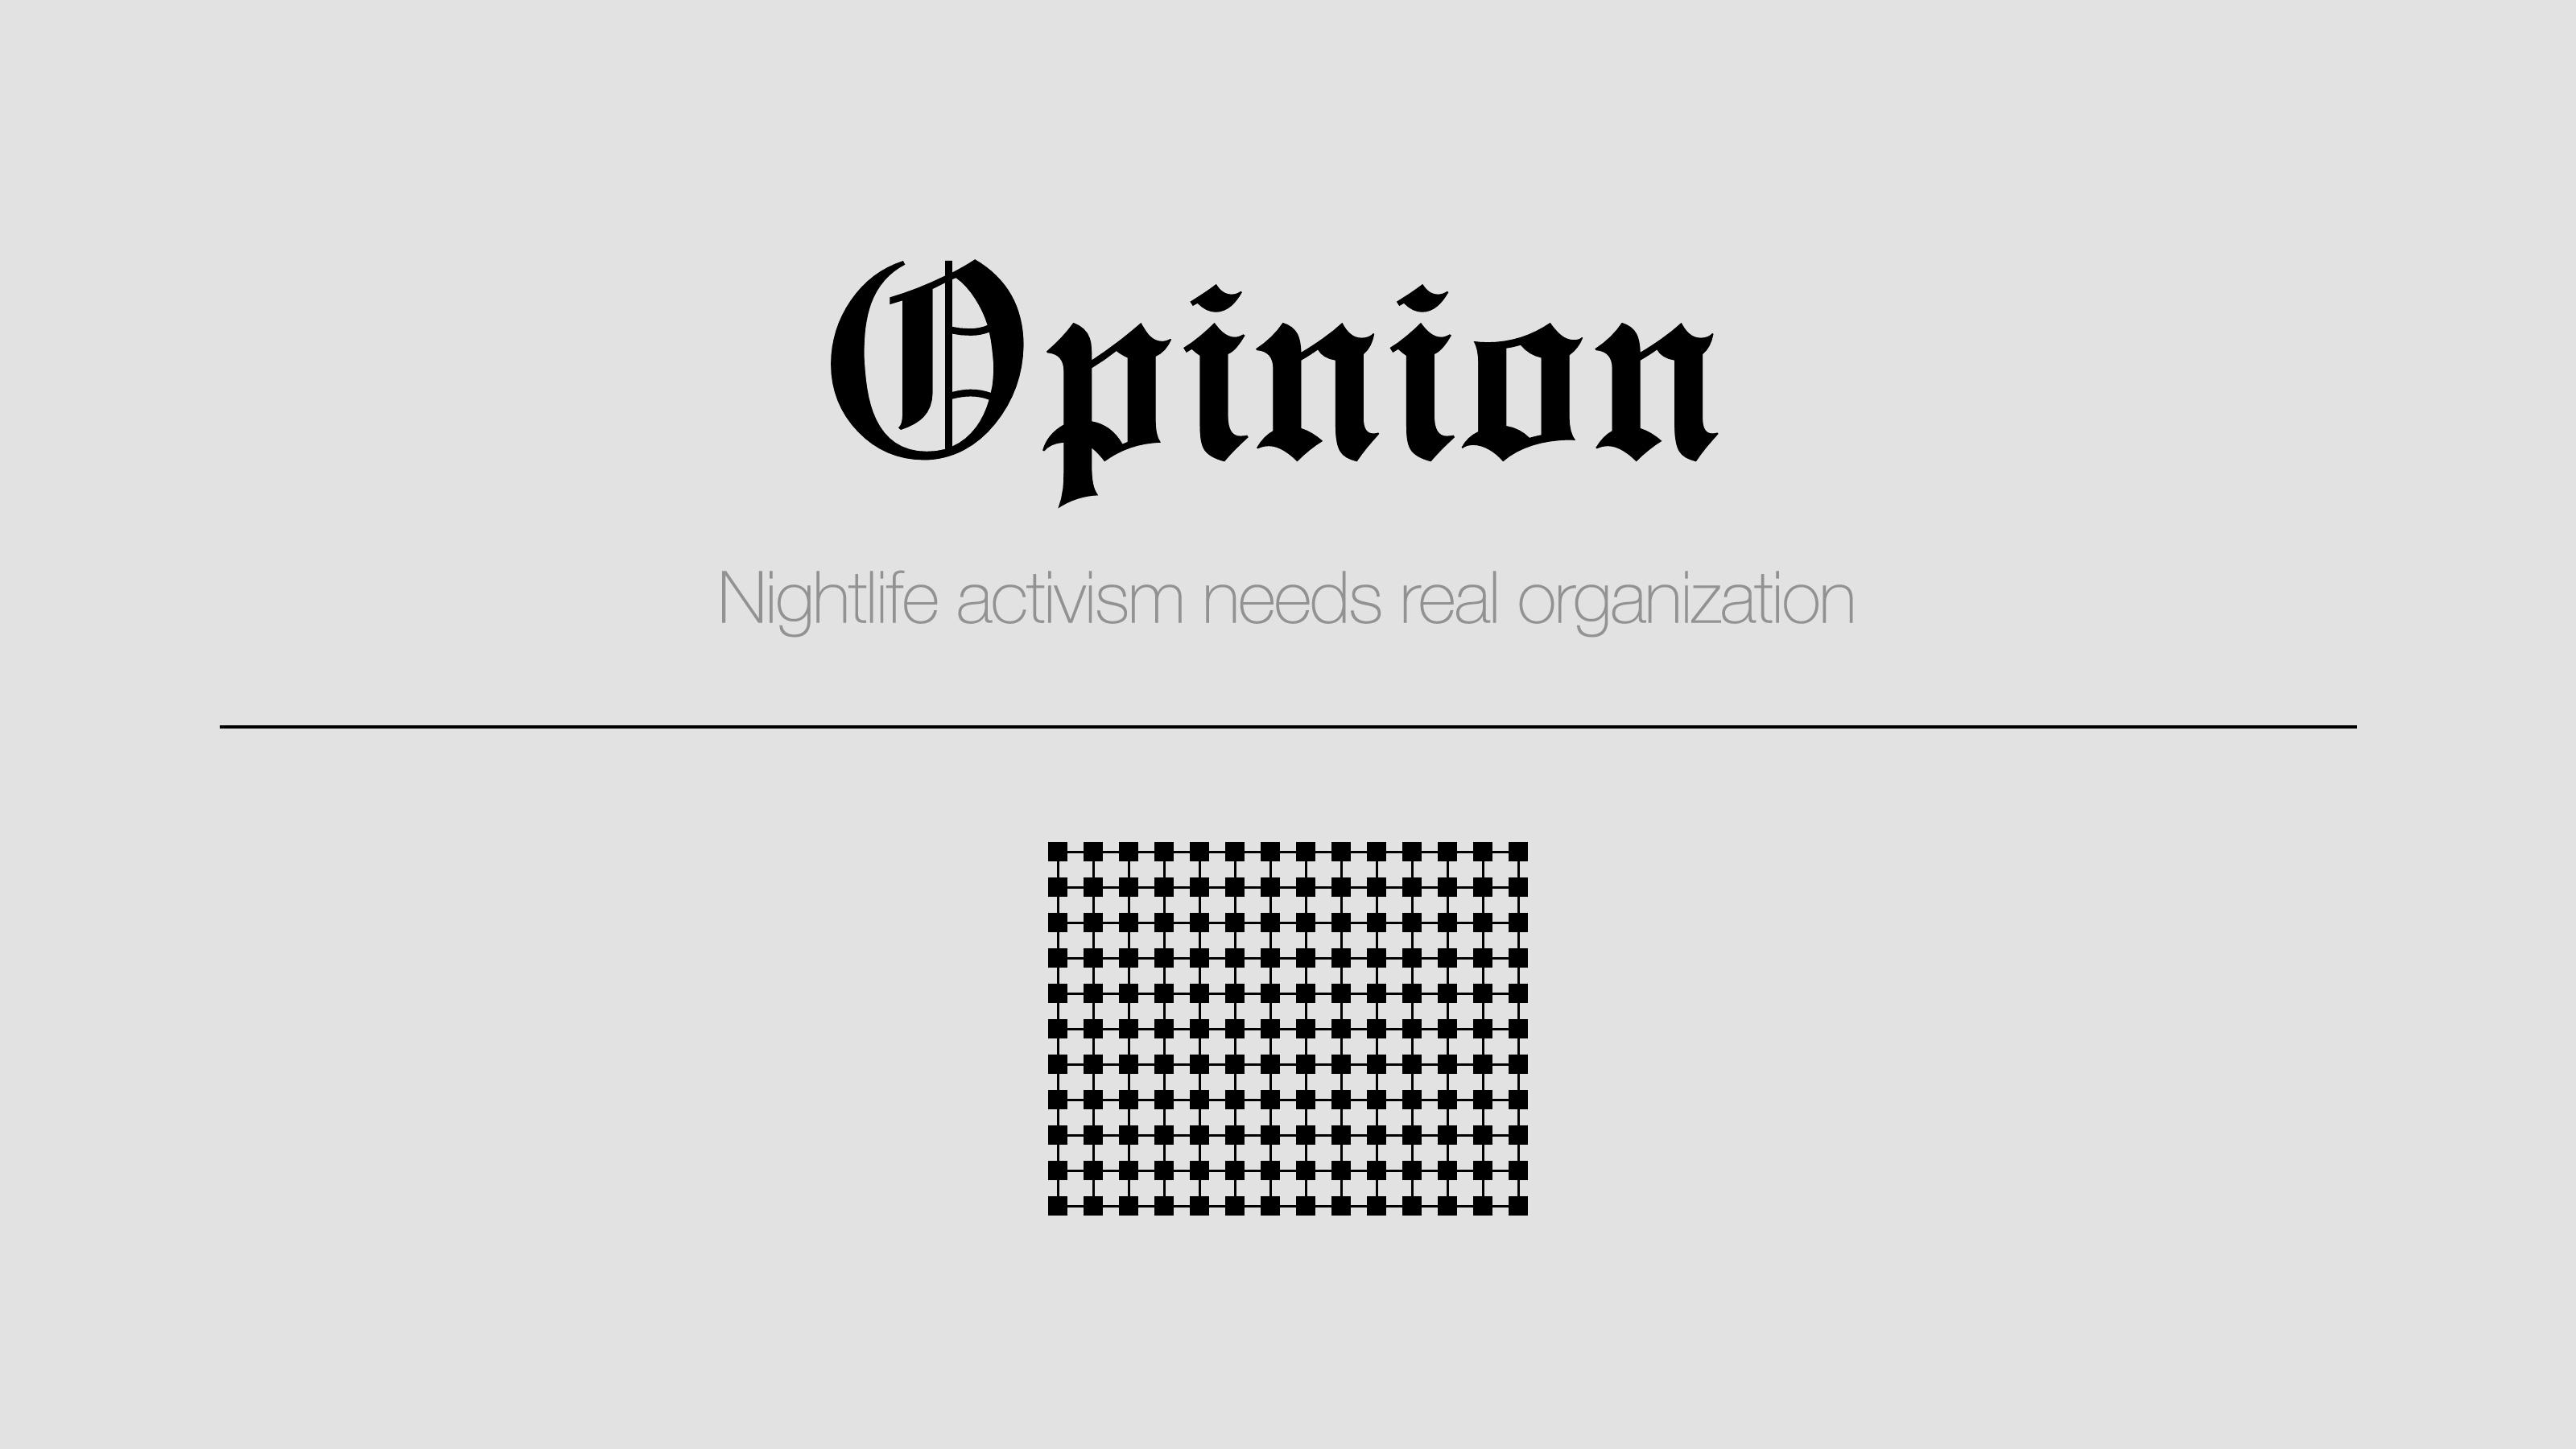 Opinion: Nightlife activism needs real organization